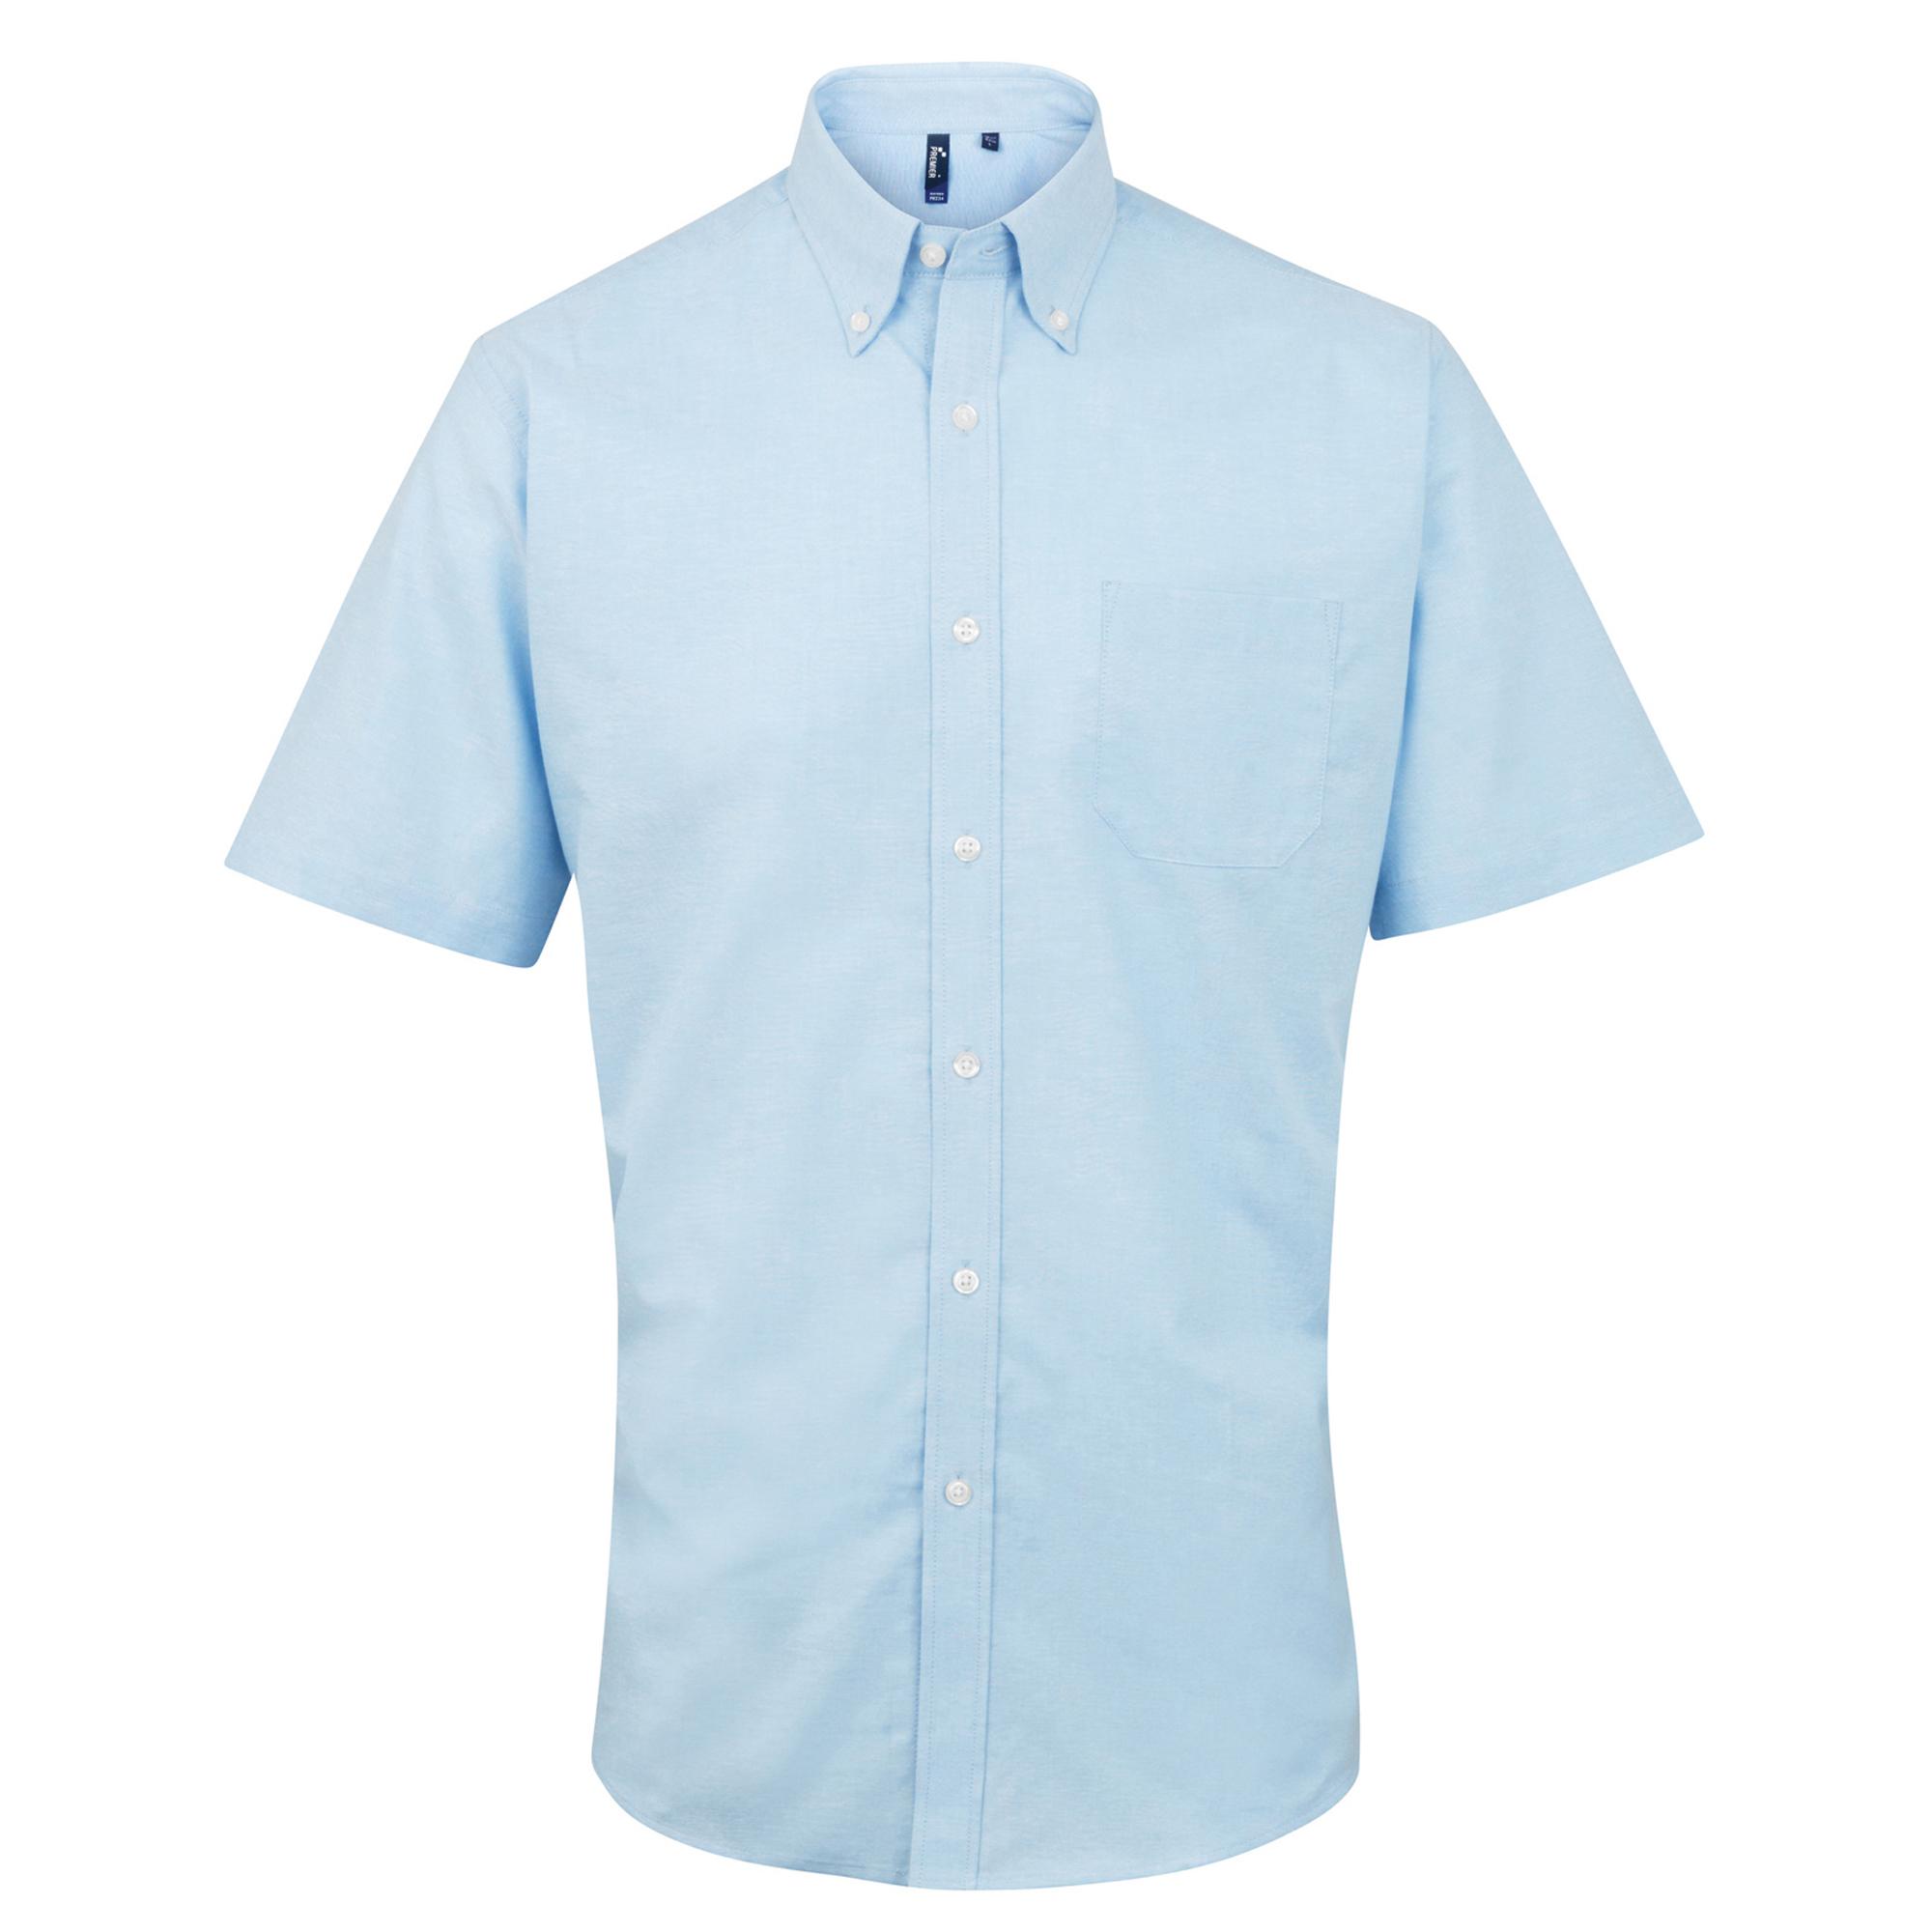 Premier Mens Signature Oxford Short Sleeve Work Shirt (17.5) (Light Blue)